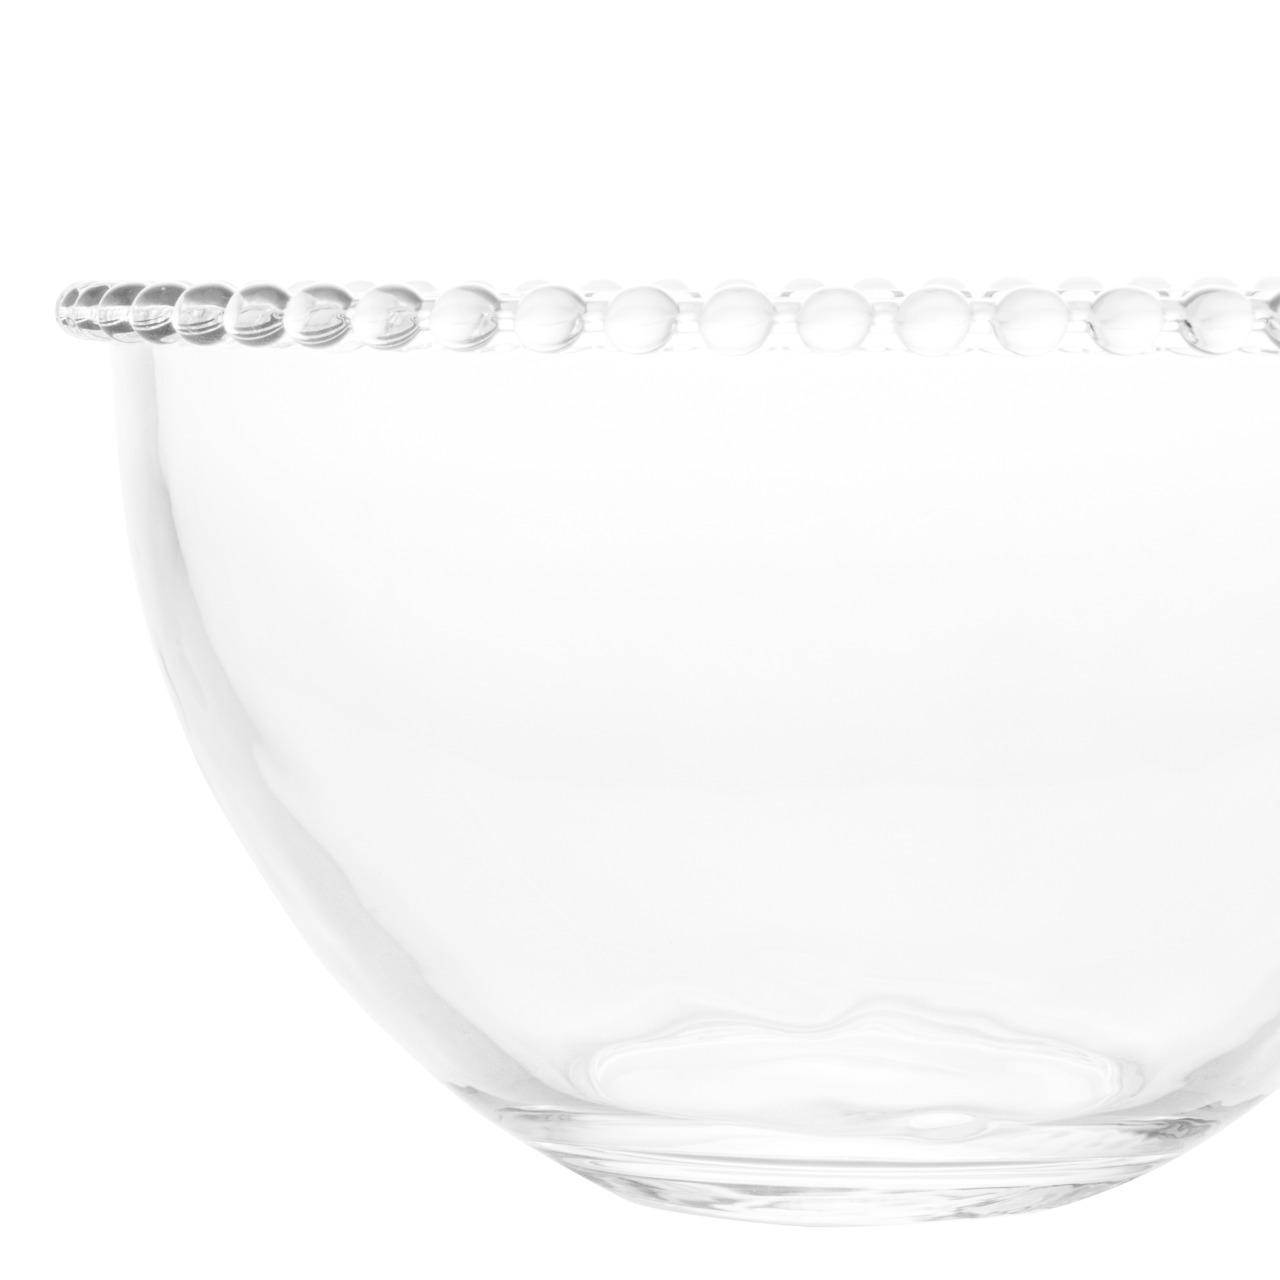 Saladeira Cristal Pearl 21x12cm - Wolff  - Haus In